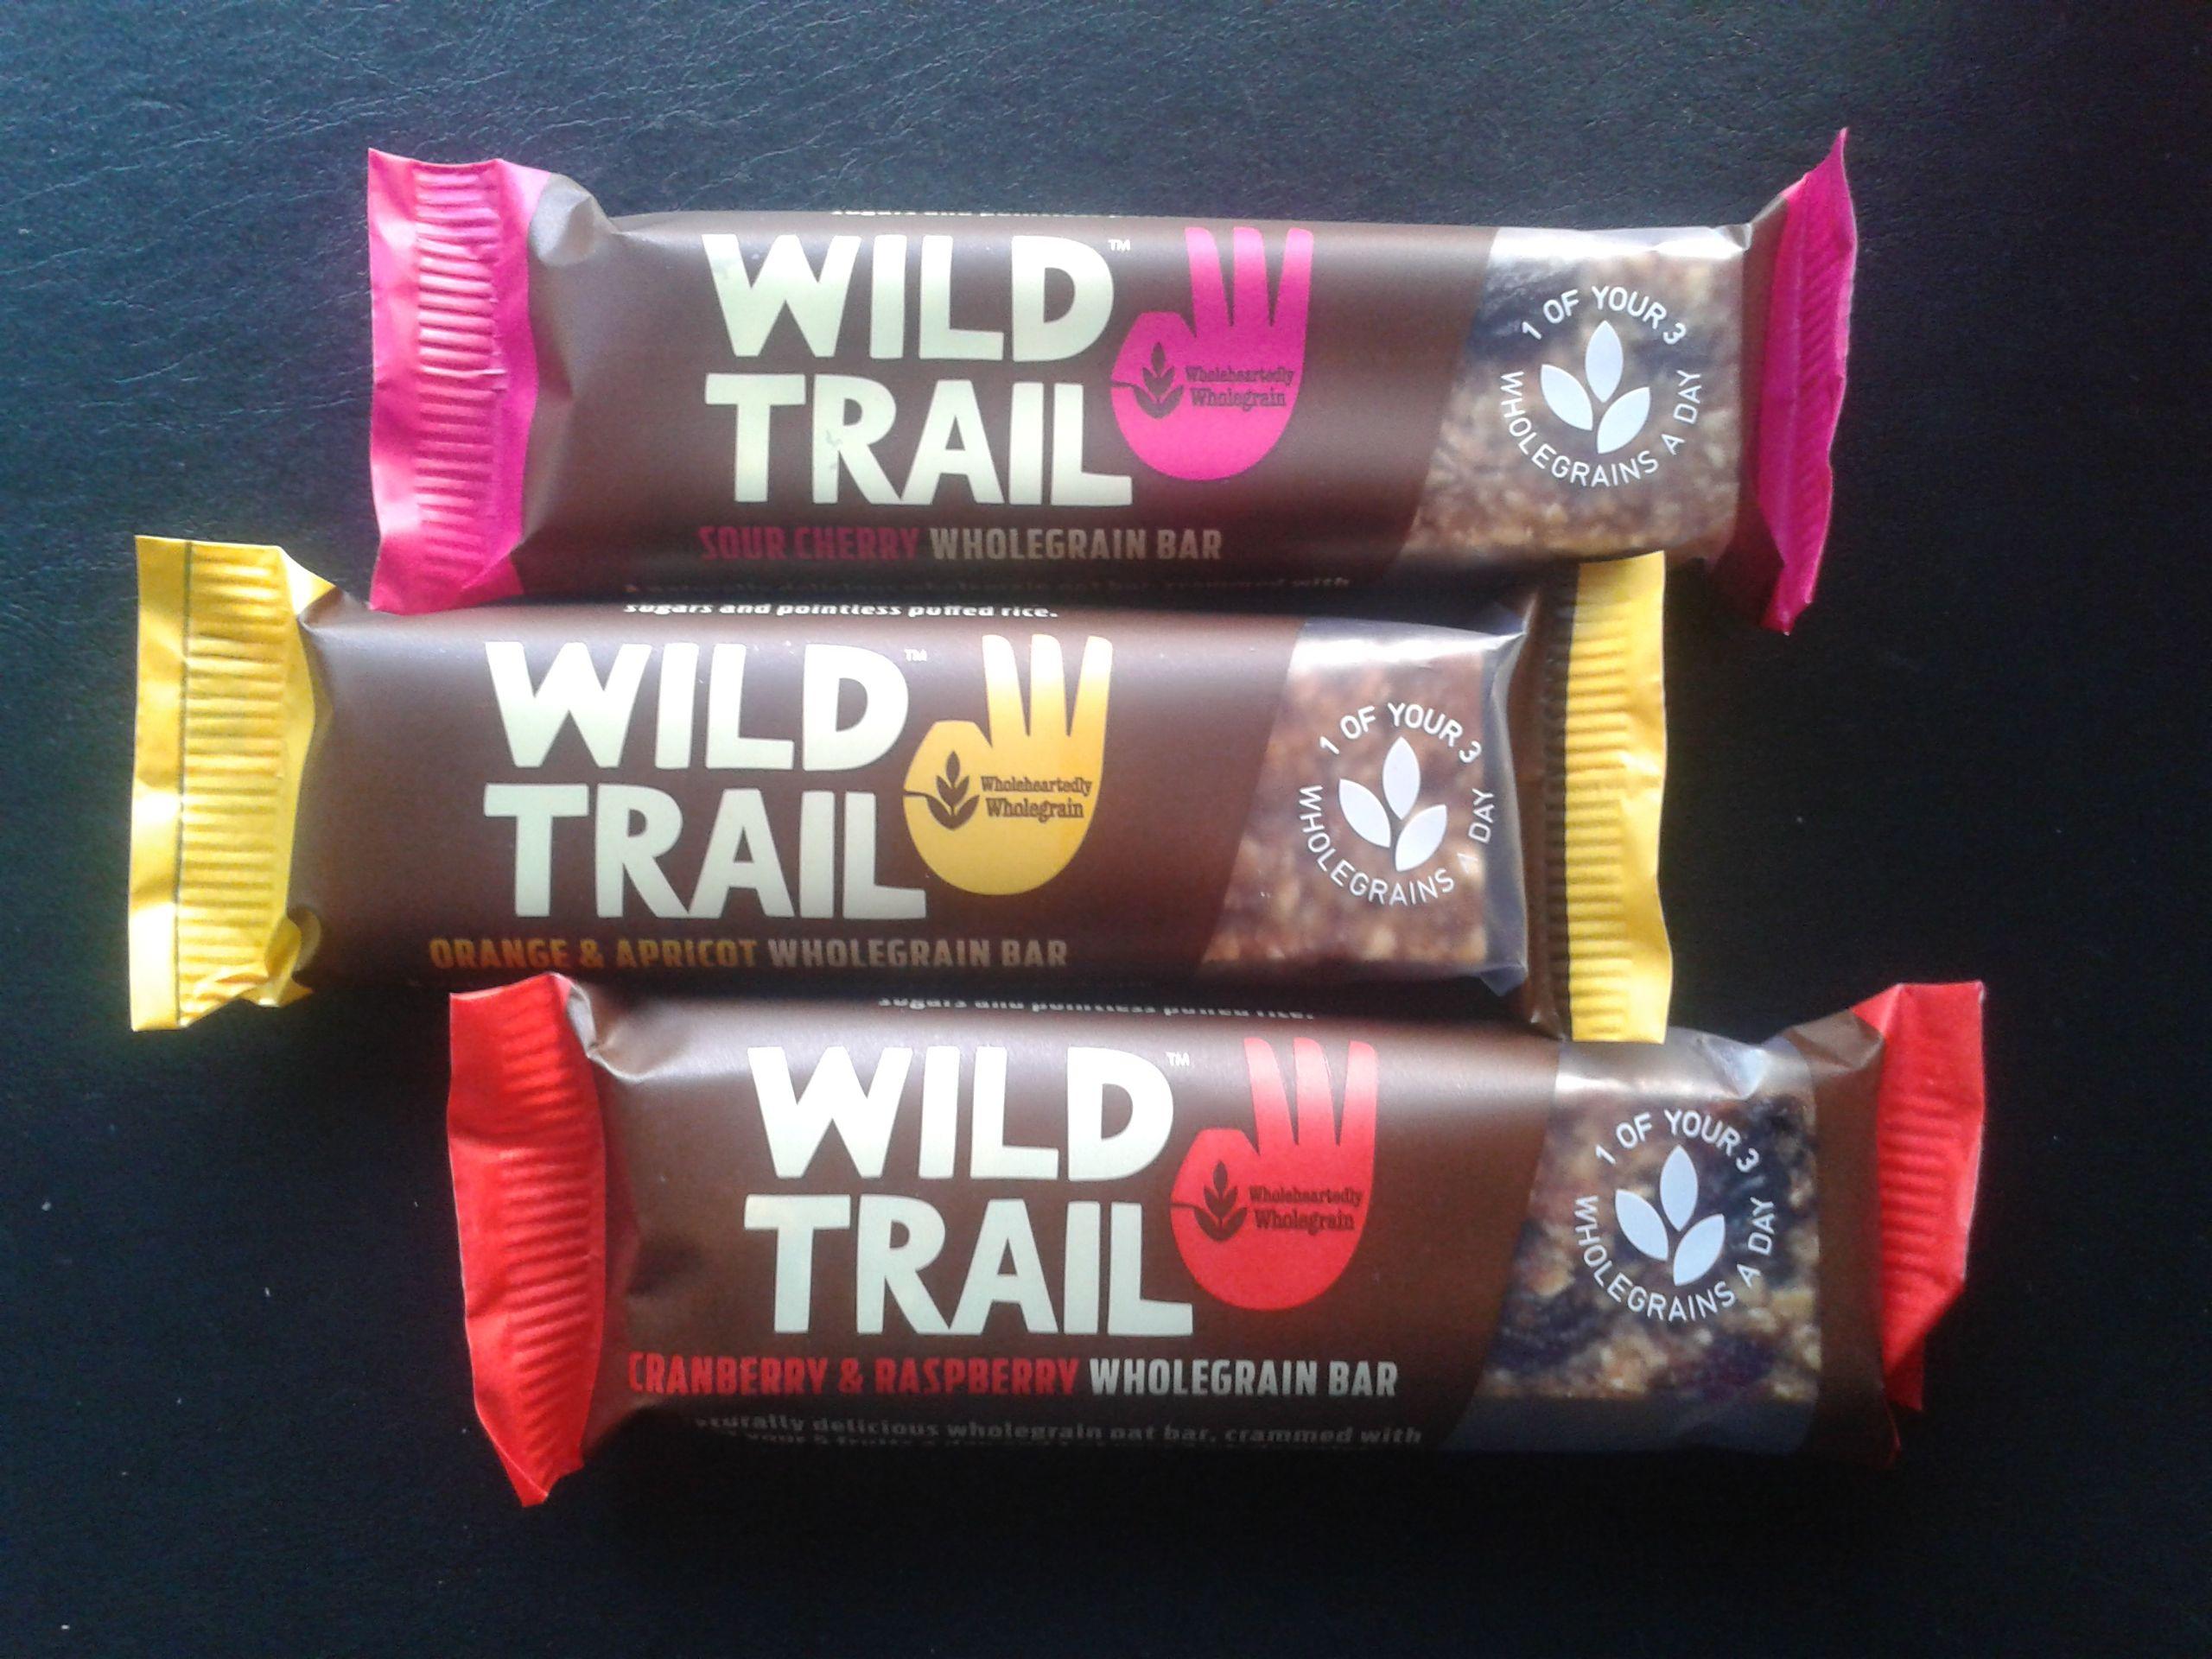 https://i2.wp.com/fatgayvegan.com/wp-content/uploads/2013/07/wild-trail.jpg?fit=2560%2C1920